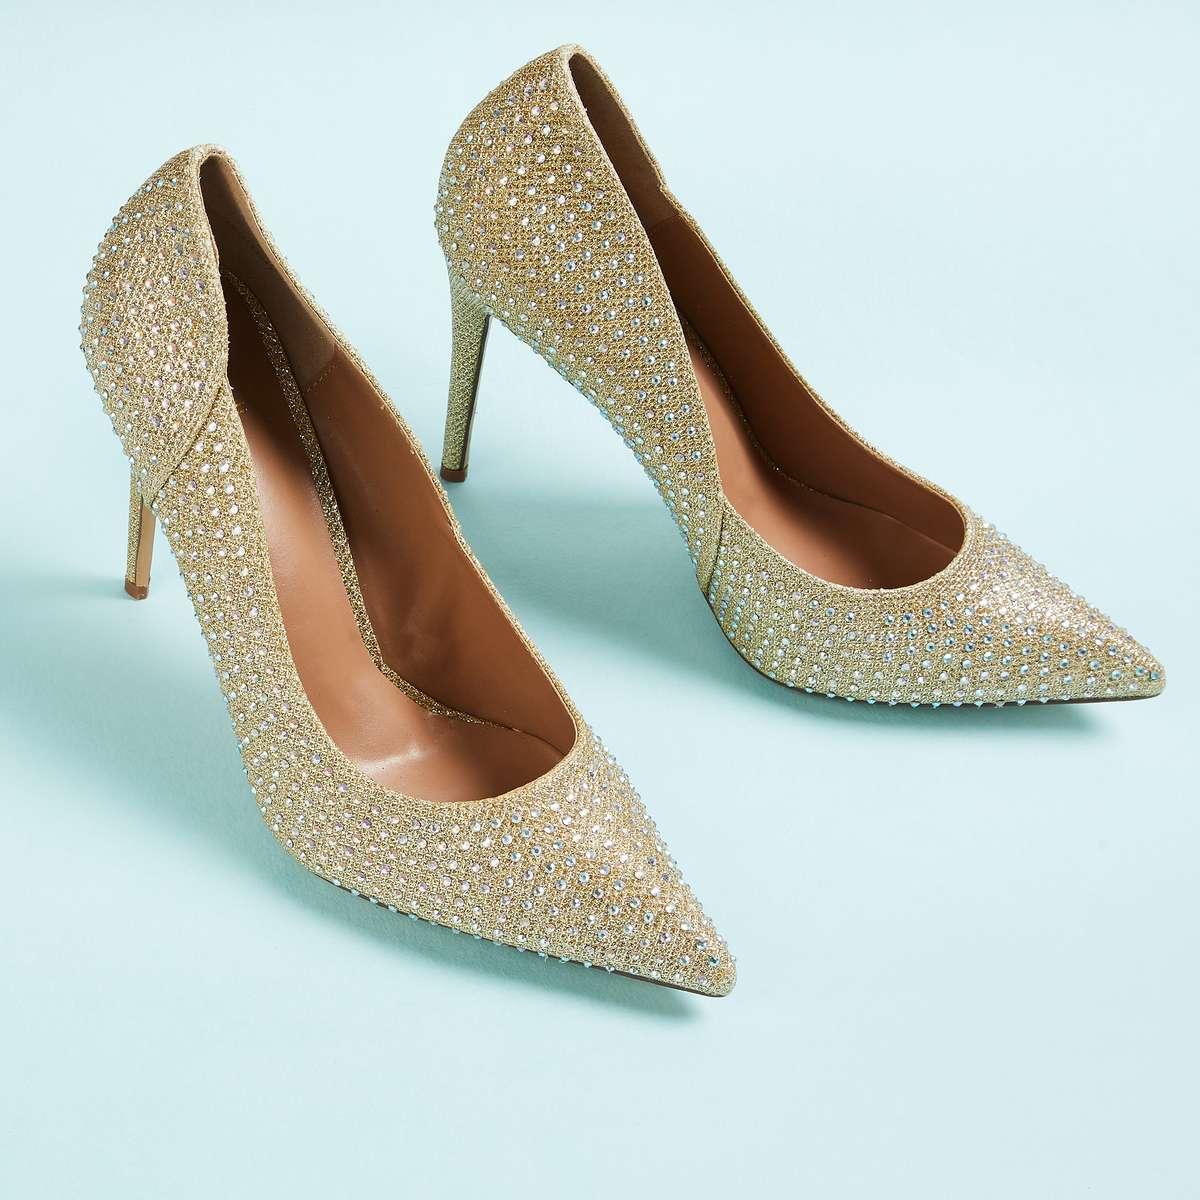 1.CATWALK Women Embellished Pointed Heels